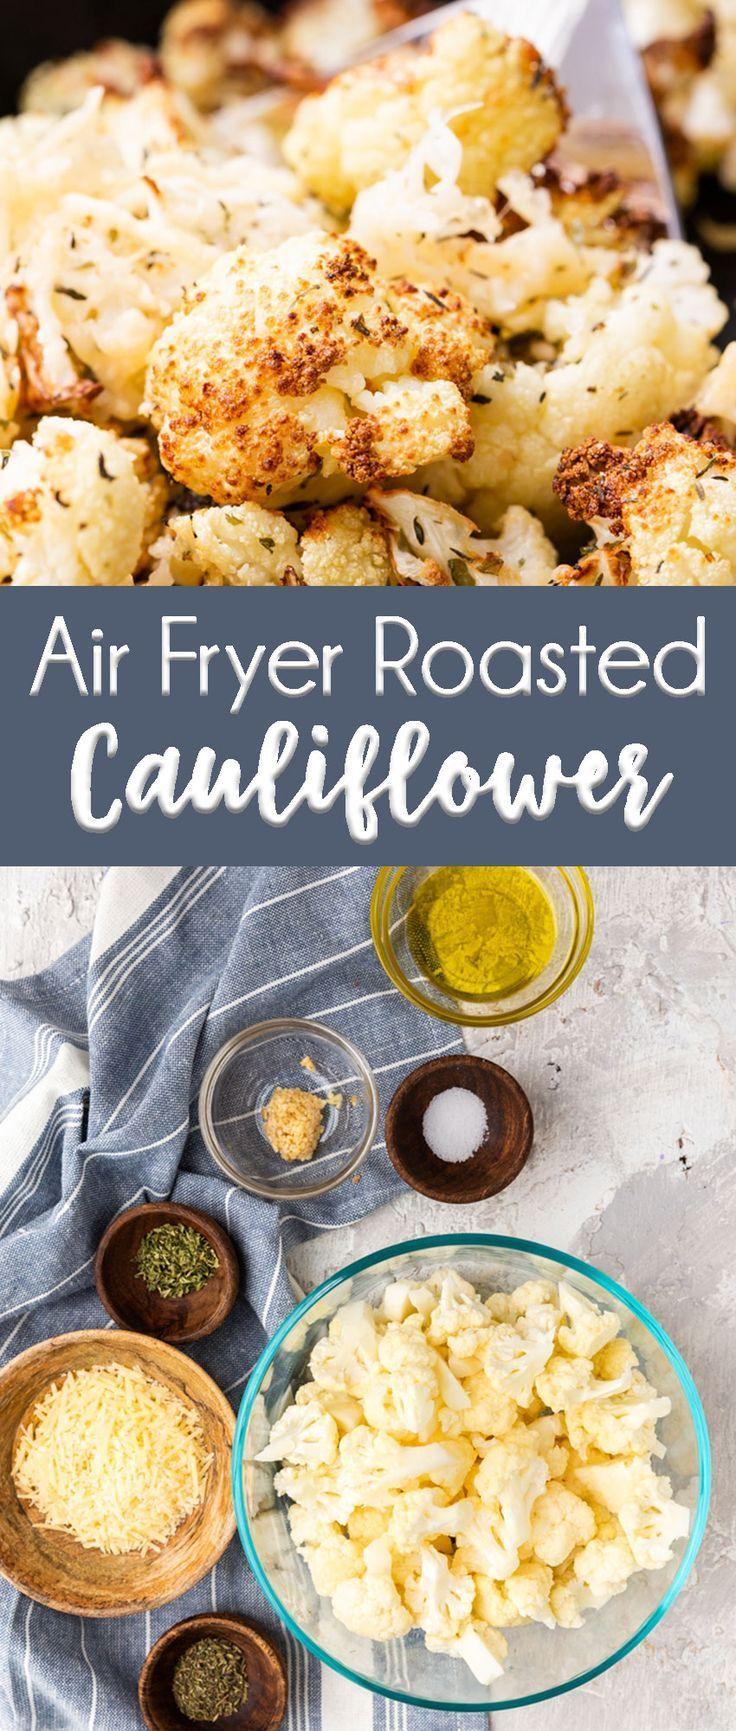 Roasted Cauliflower – Air Fryer – Easy Peasy Meals